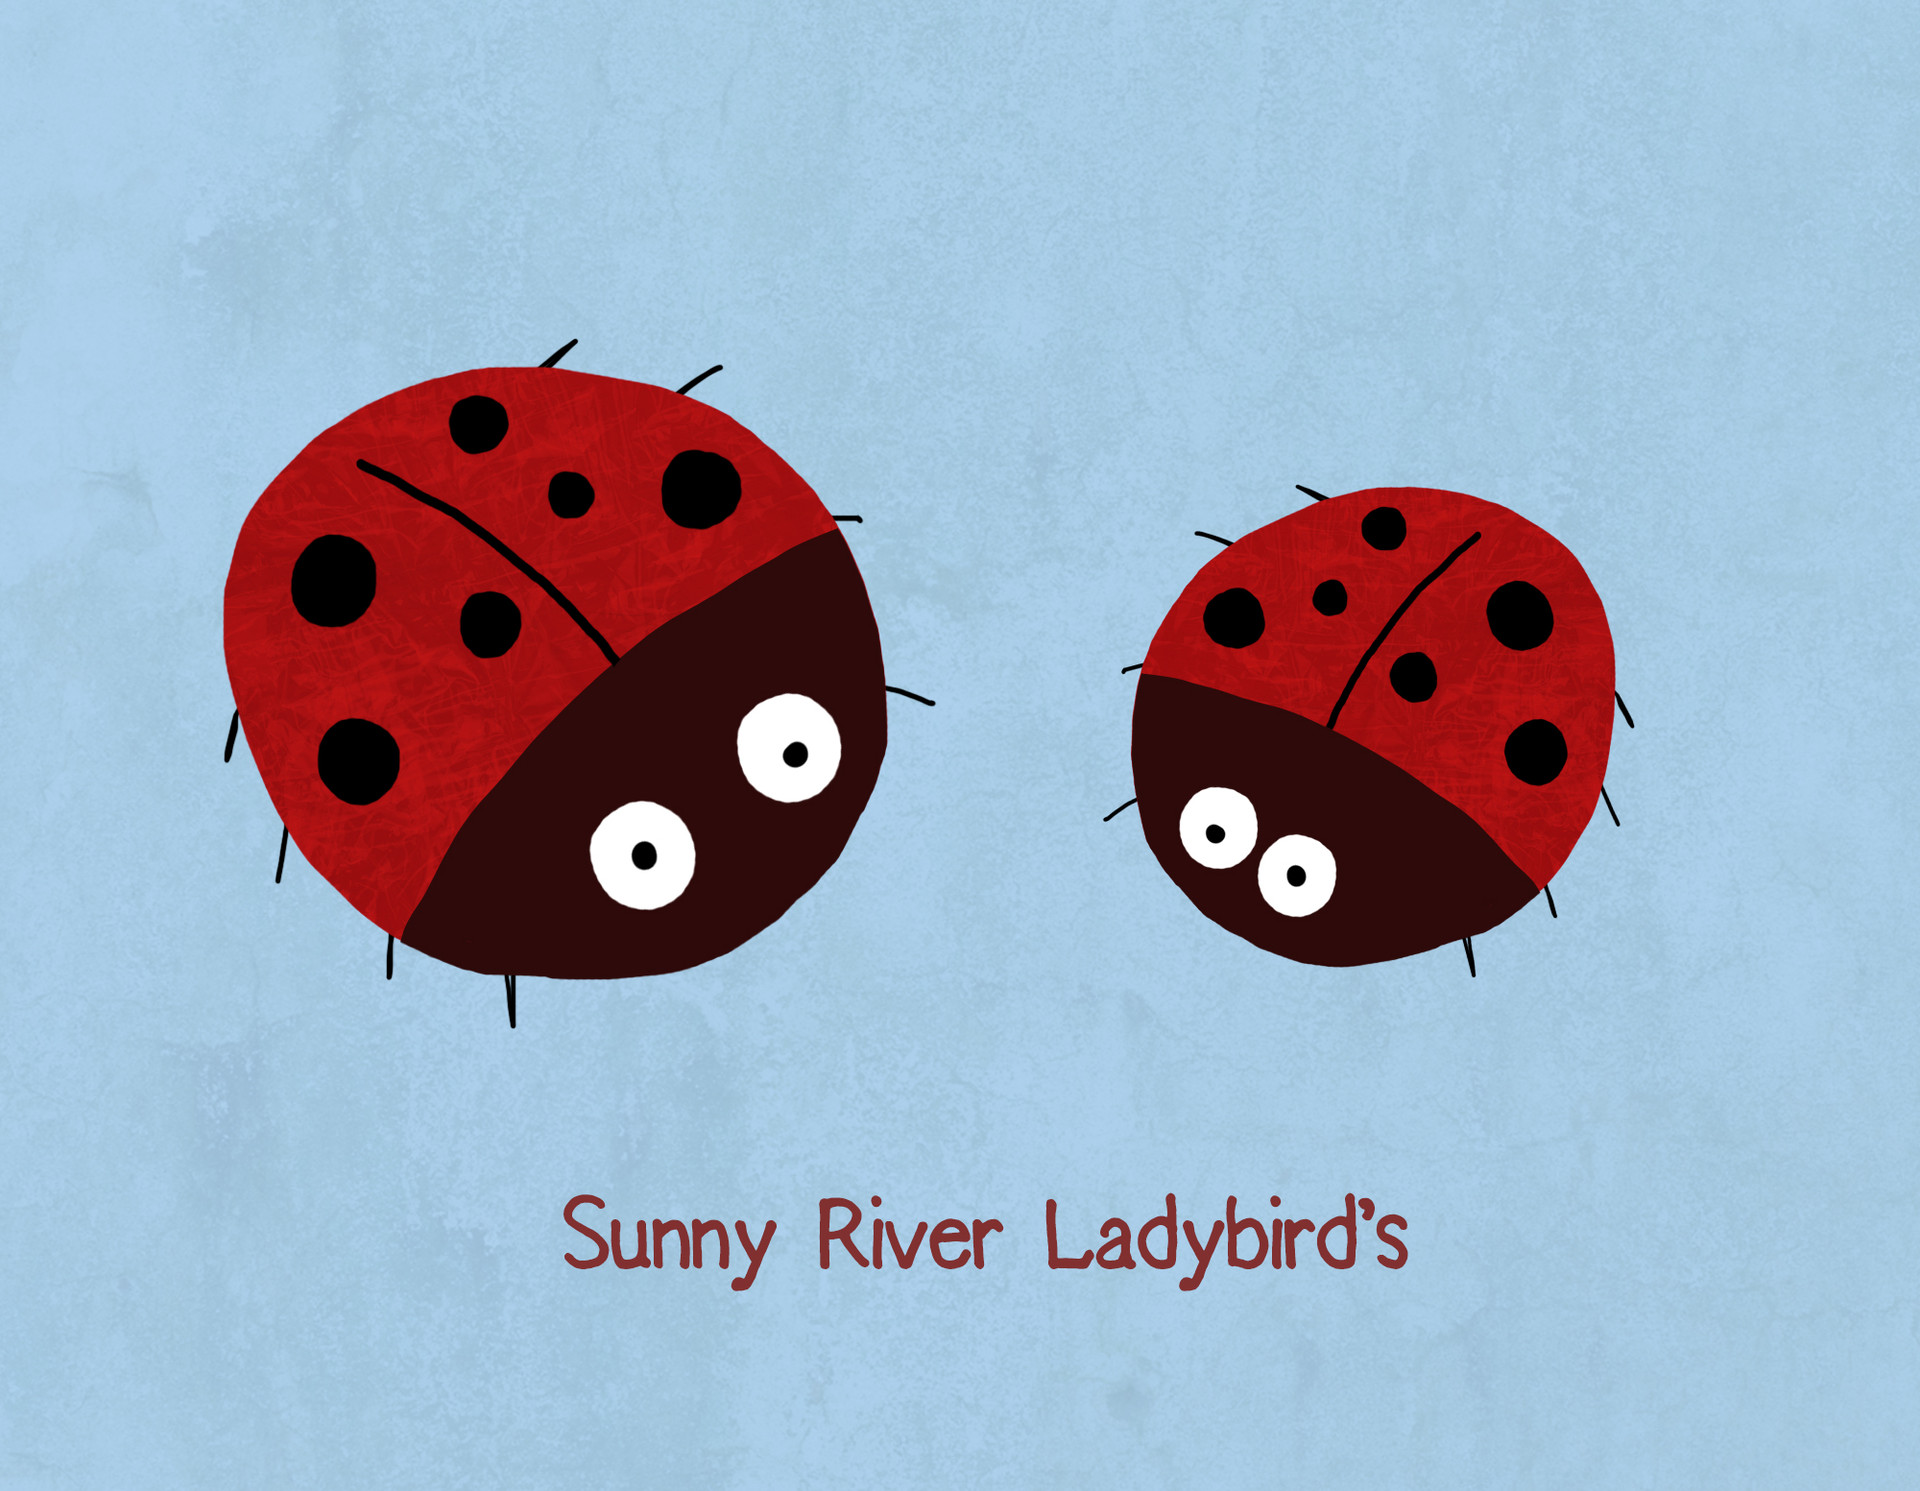 LADYBIRD DESIGN